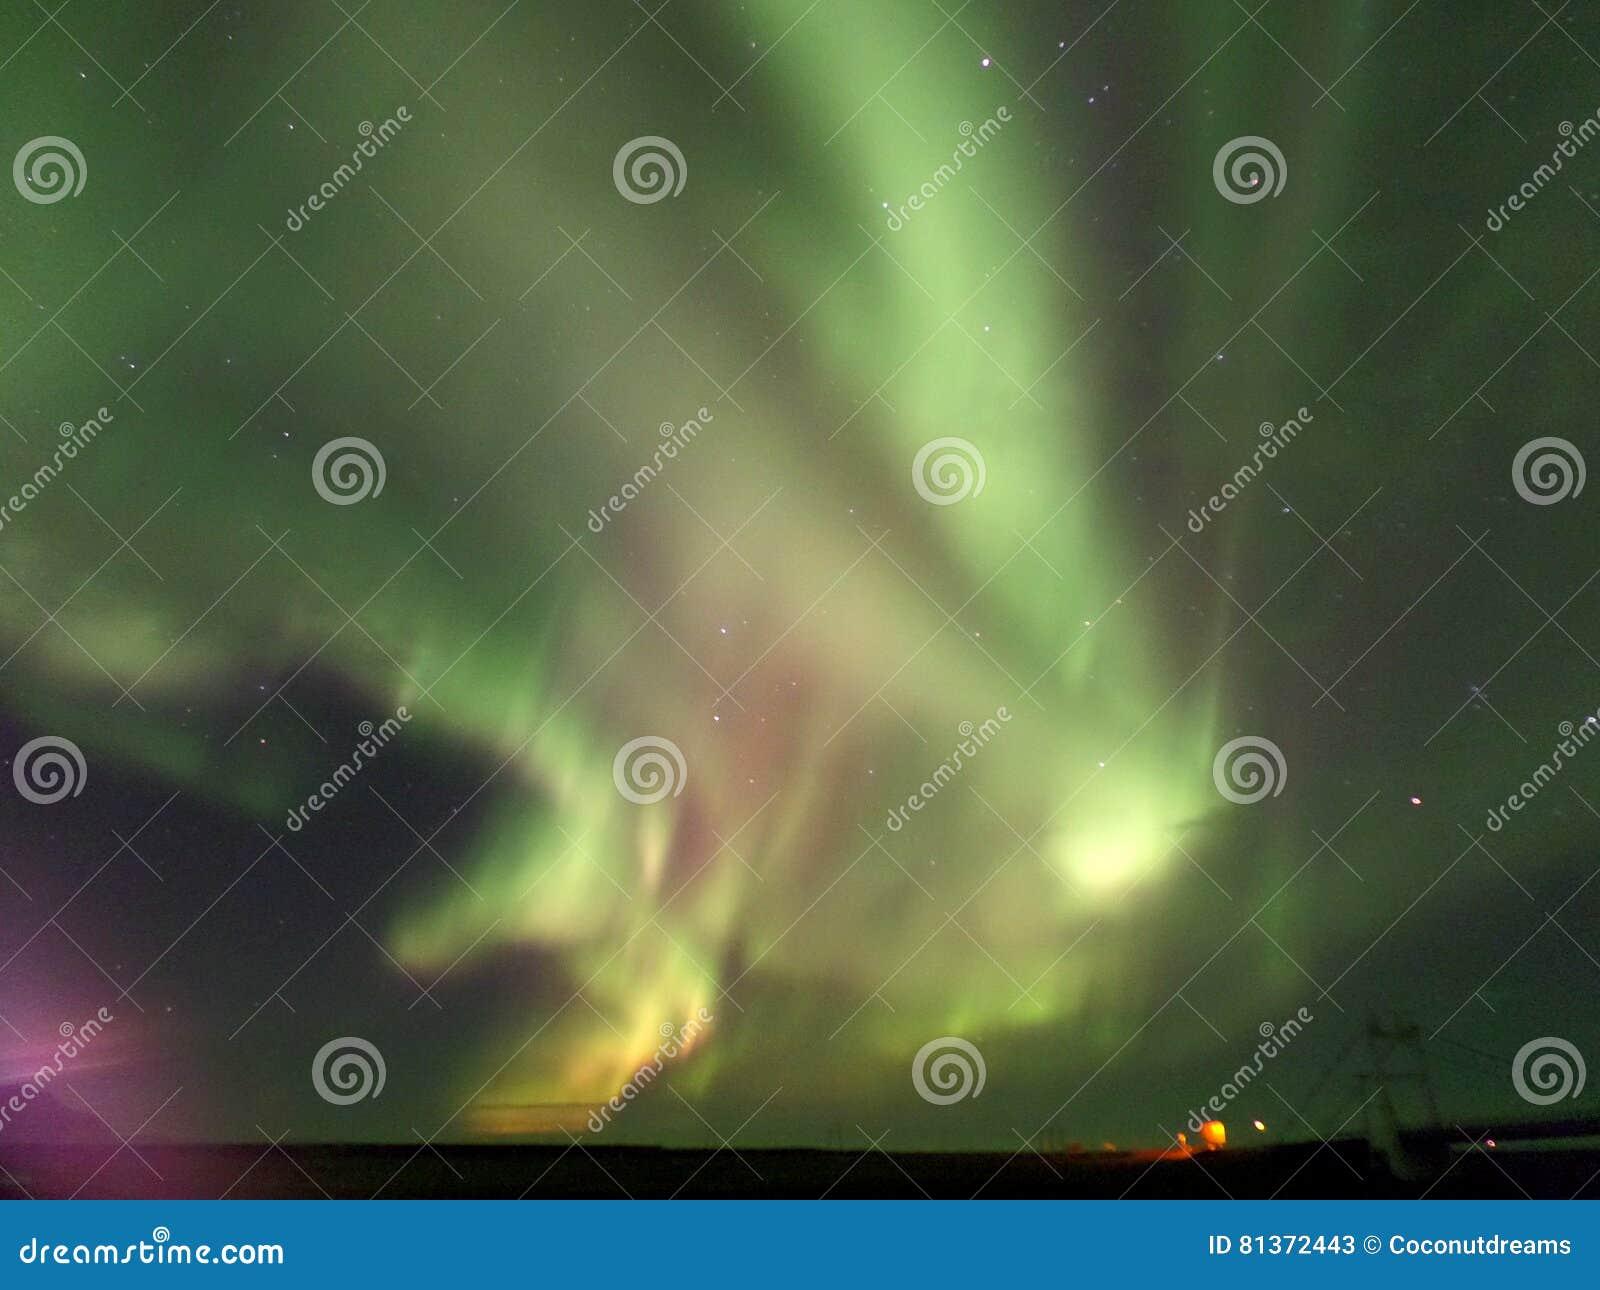 Adembenemende groene en roze Aurora Borealis die op de nachthemel opvlammen